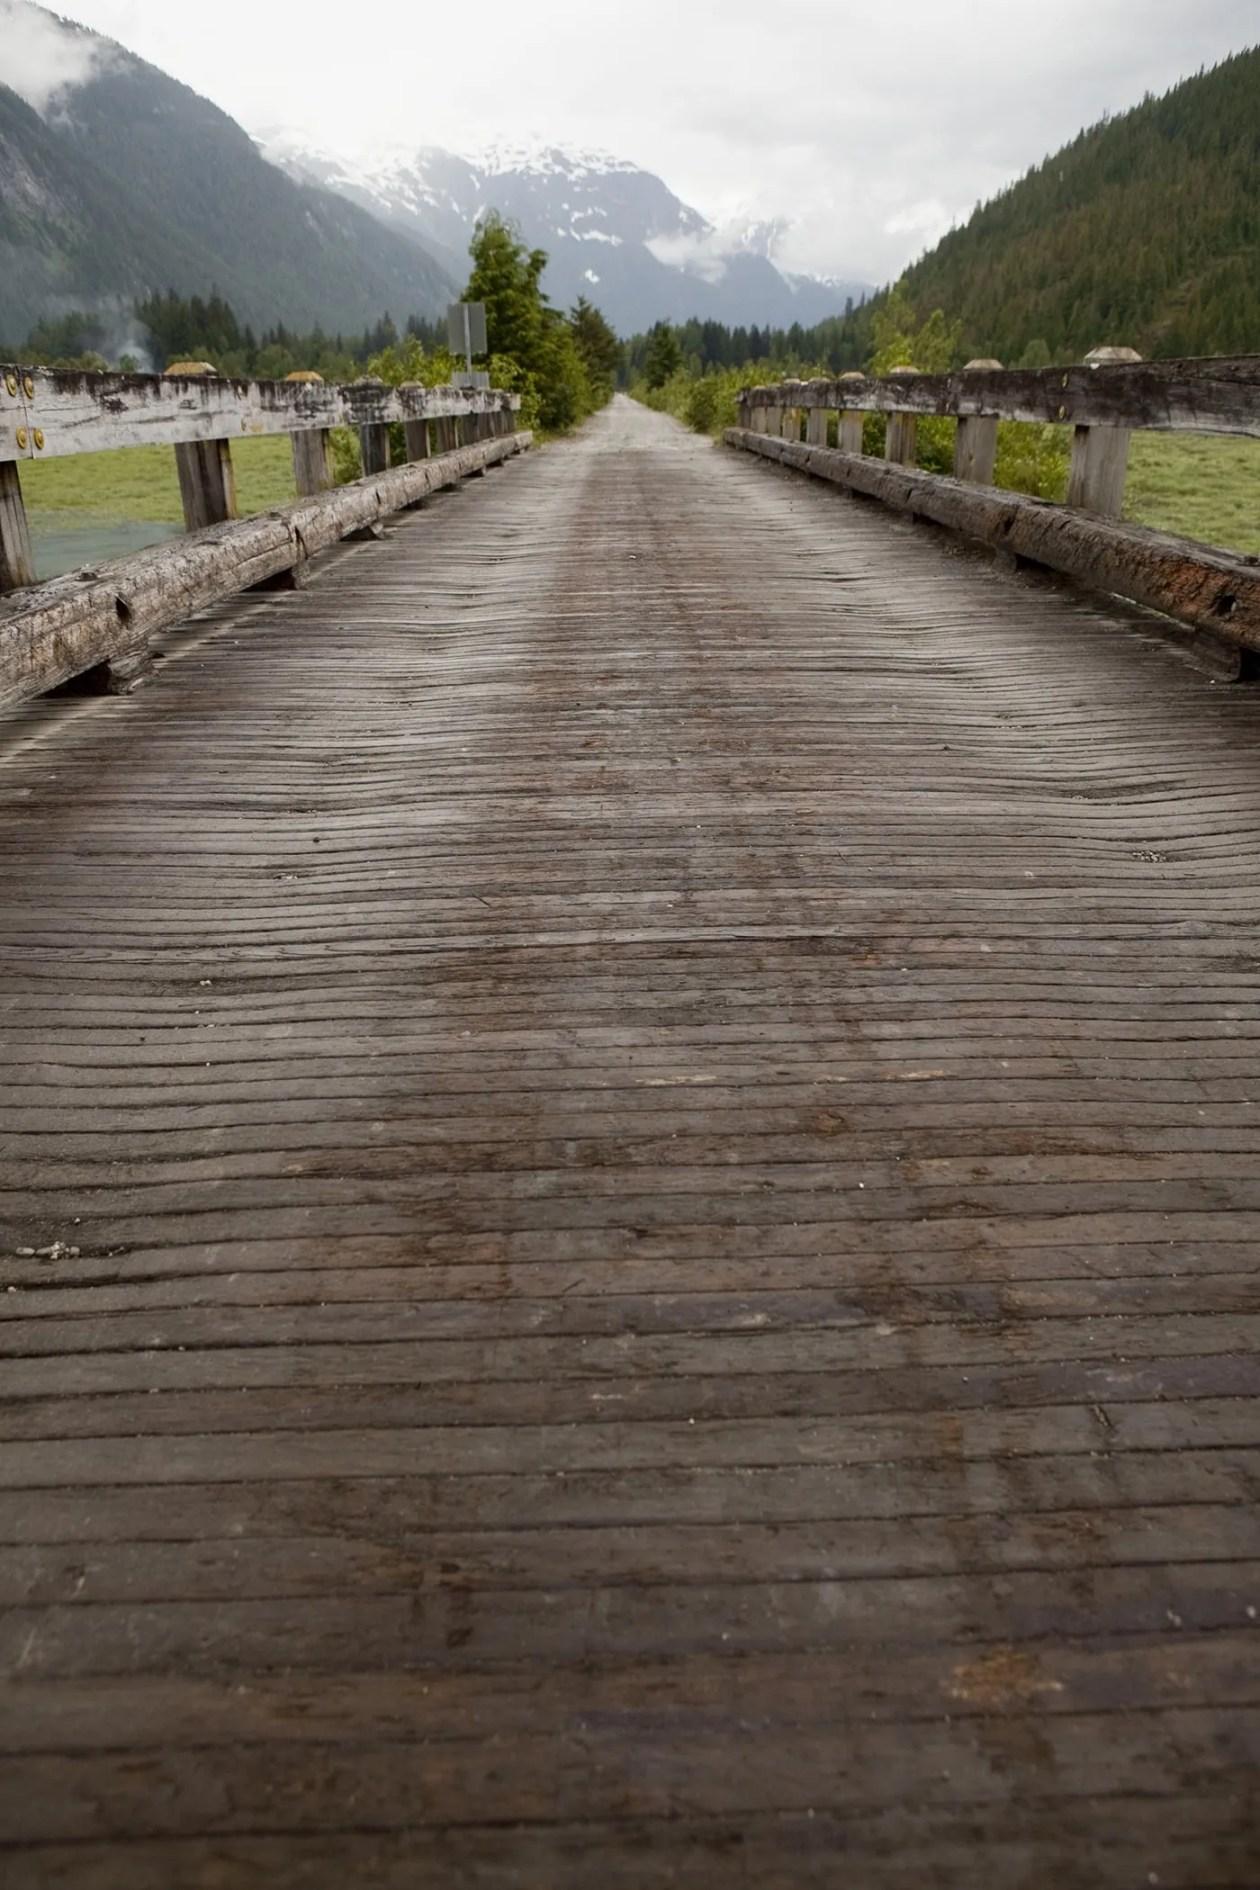 Bridge on the pier in Hyder, Alaska.